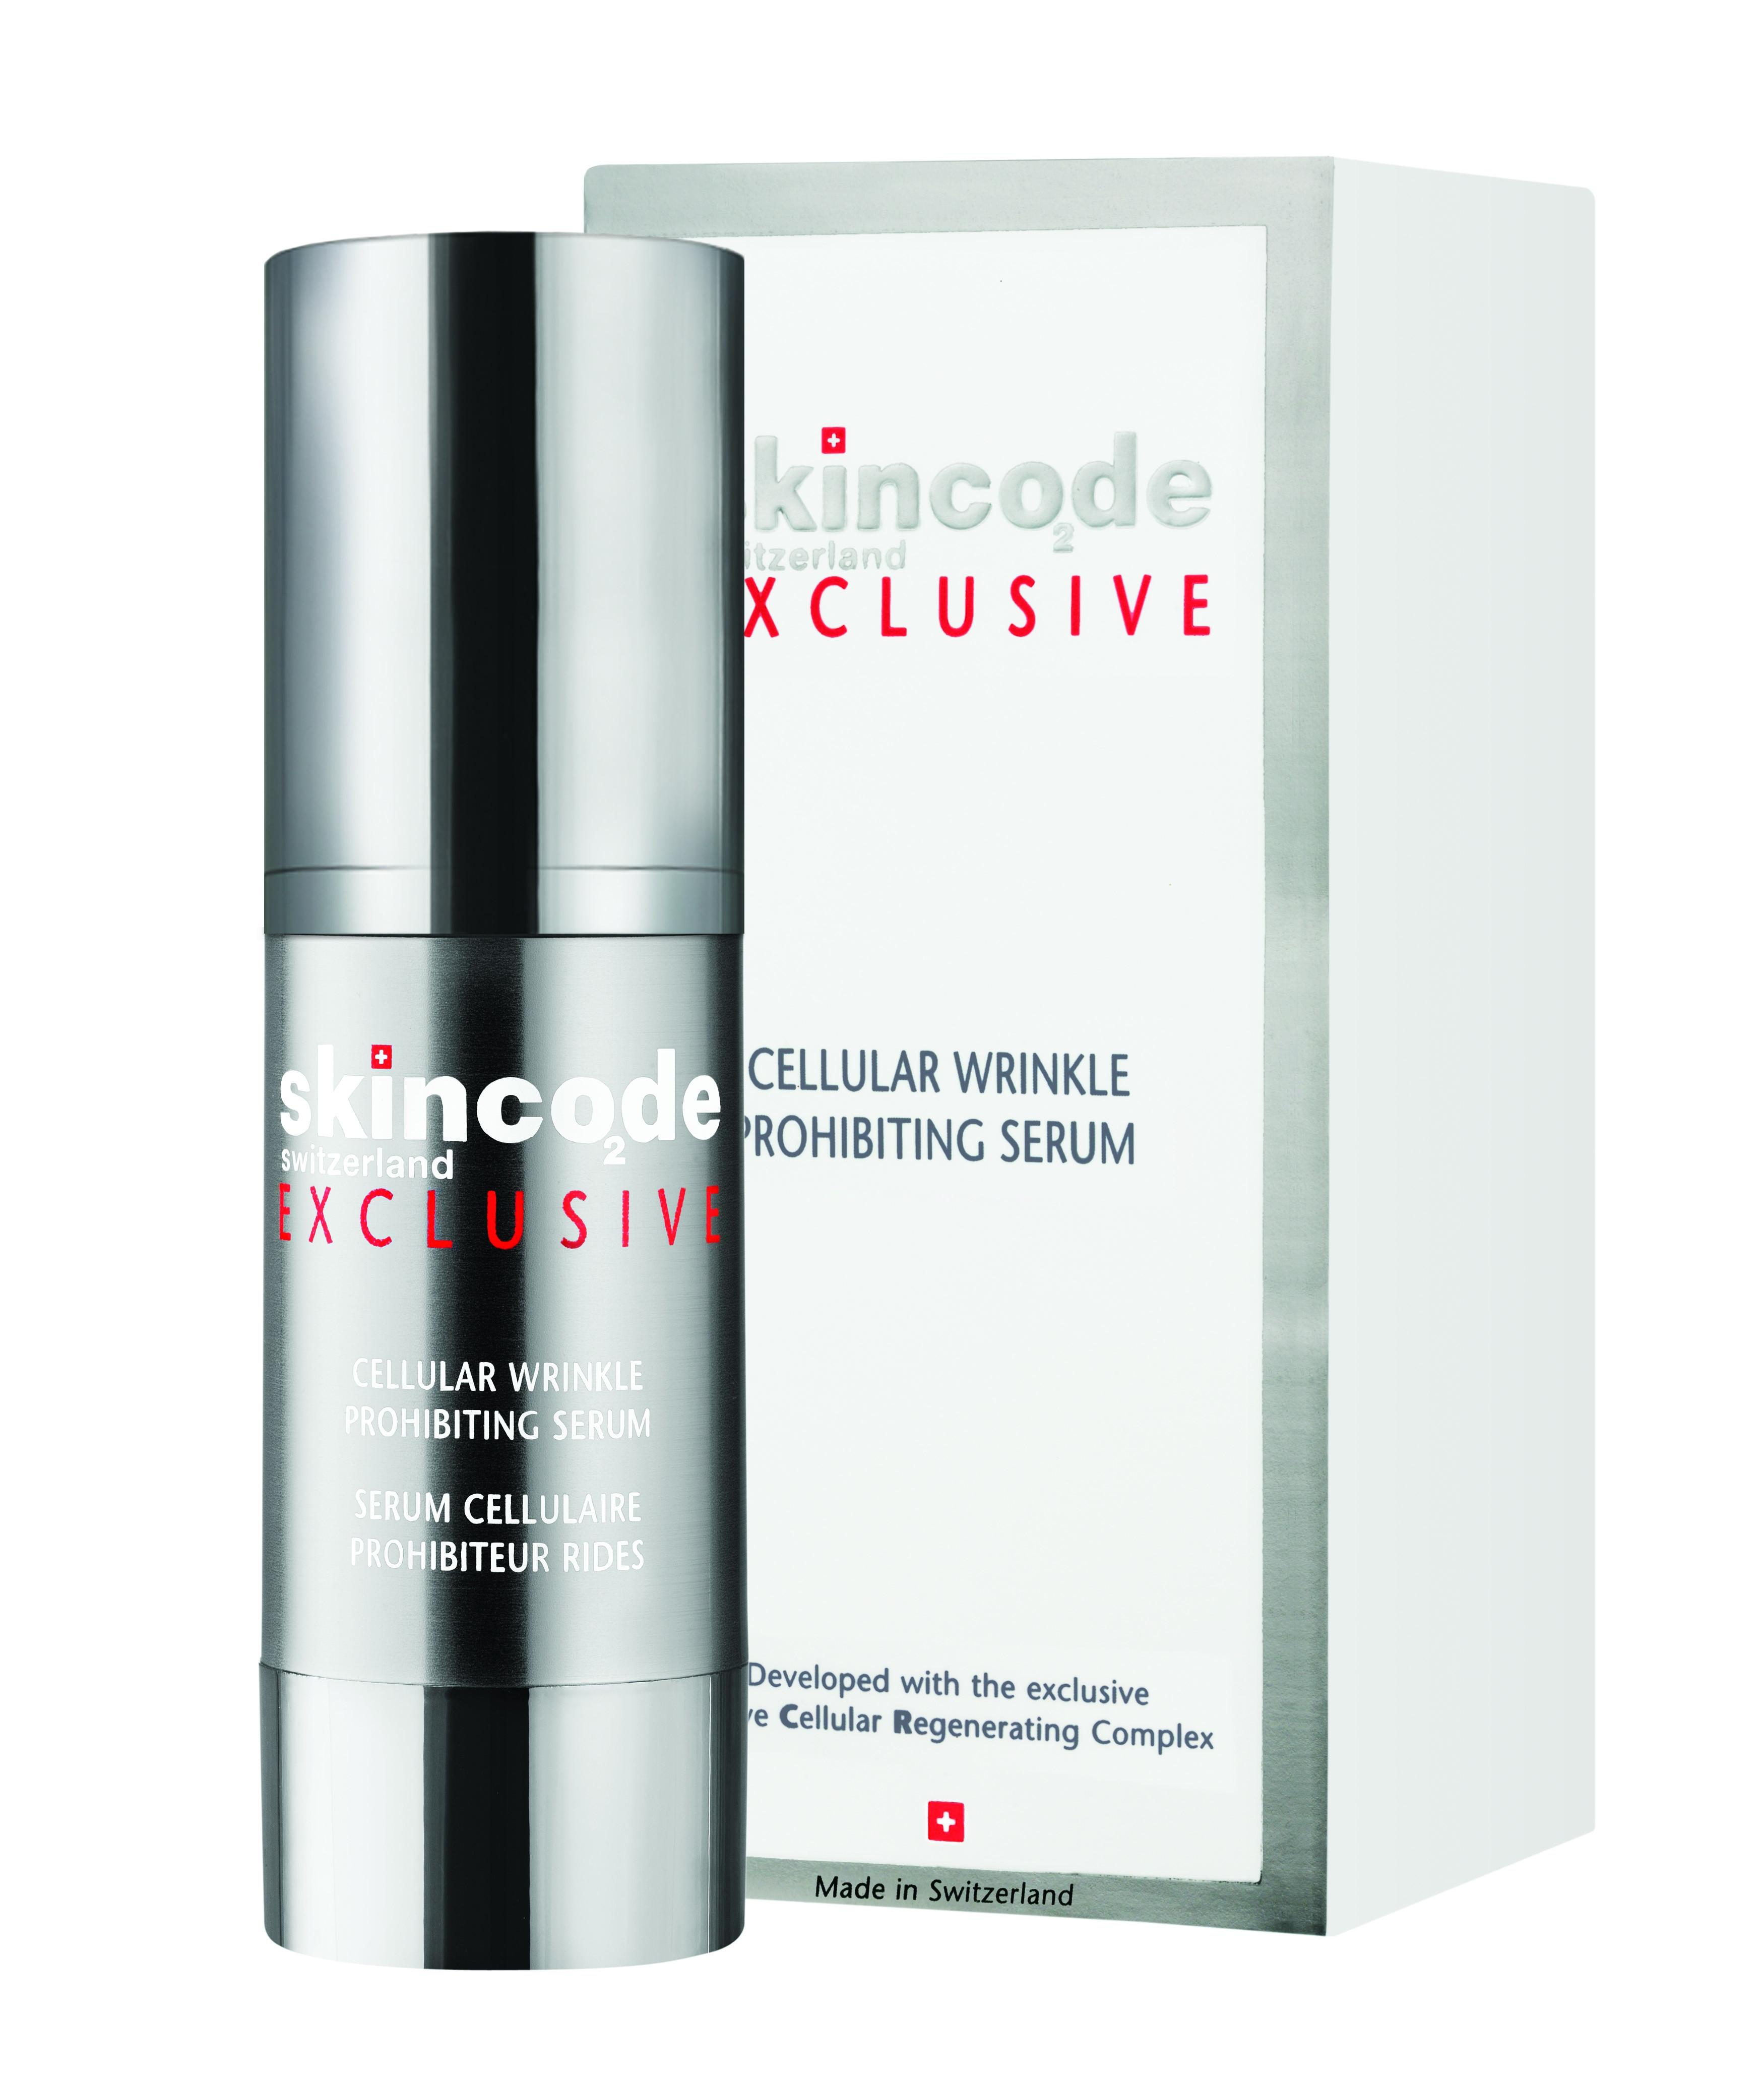 "СКИНКОД ЕКСКЛУЗИВ Клетъчен серум ""Стоп на бръчките"" 30мл | SKINCODE EXCLUSIVE Cellular wrinkle prohibiting serum 30ml"